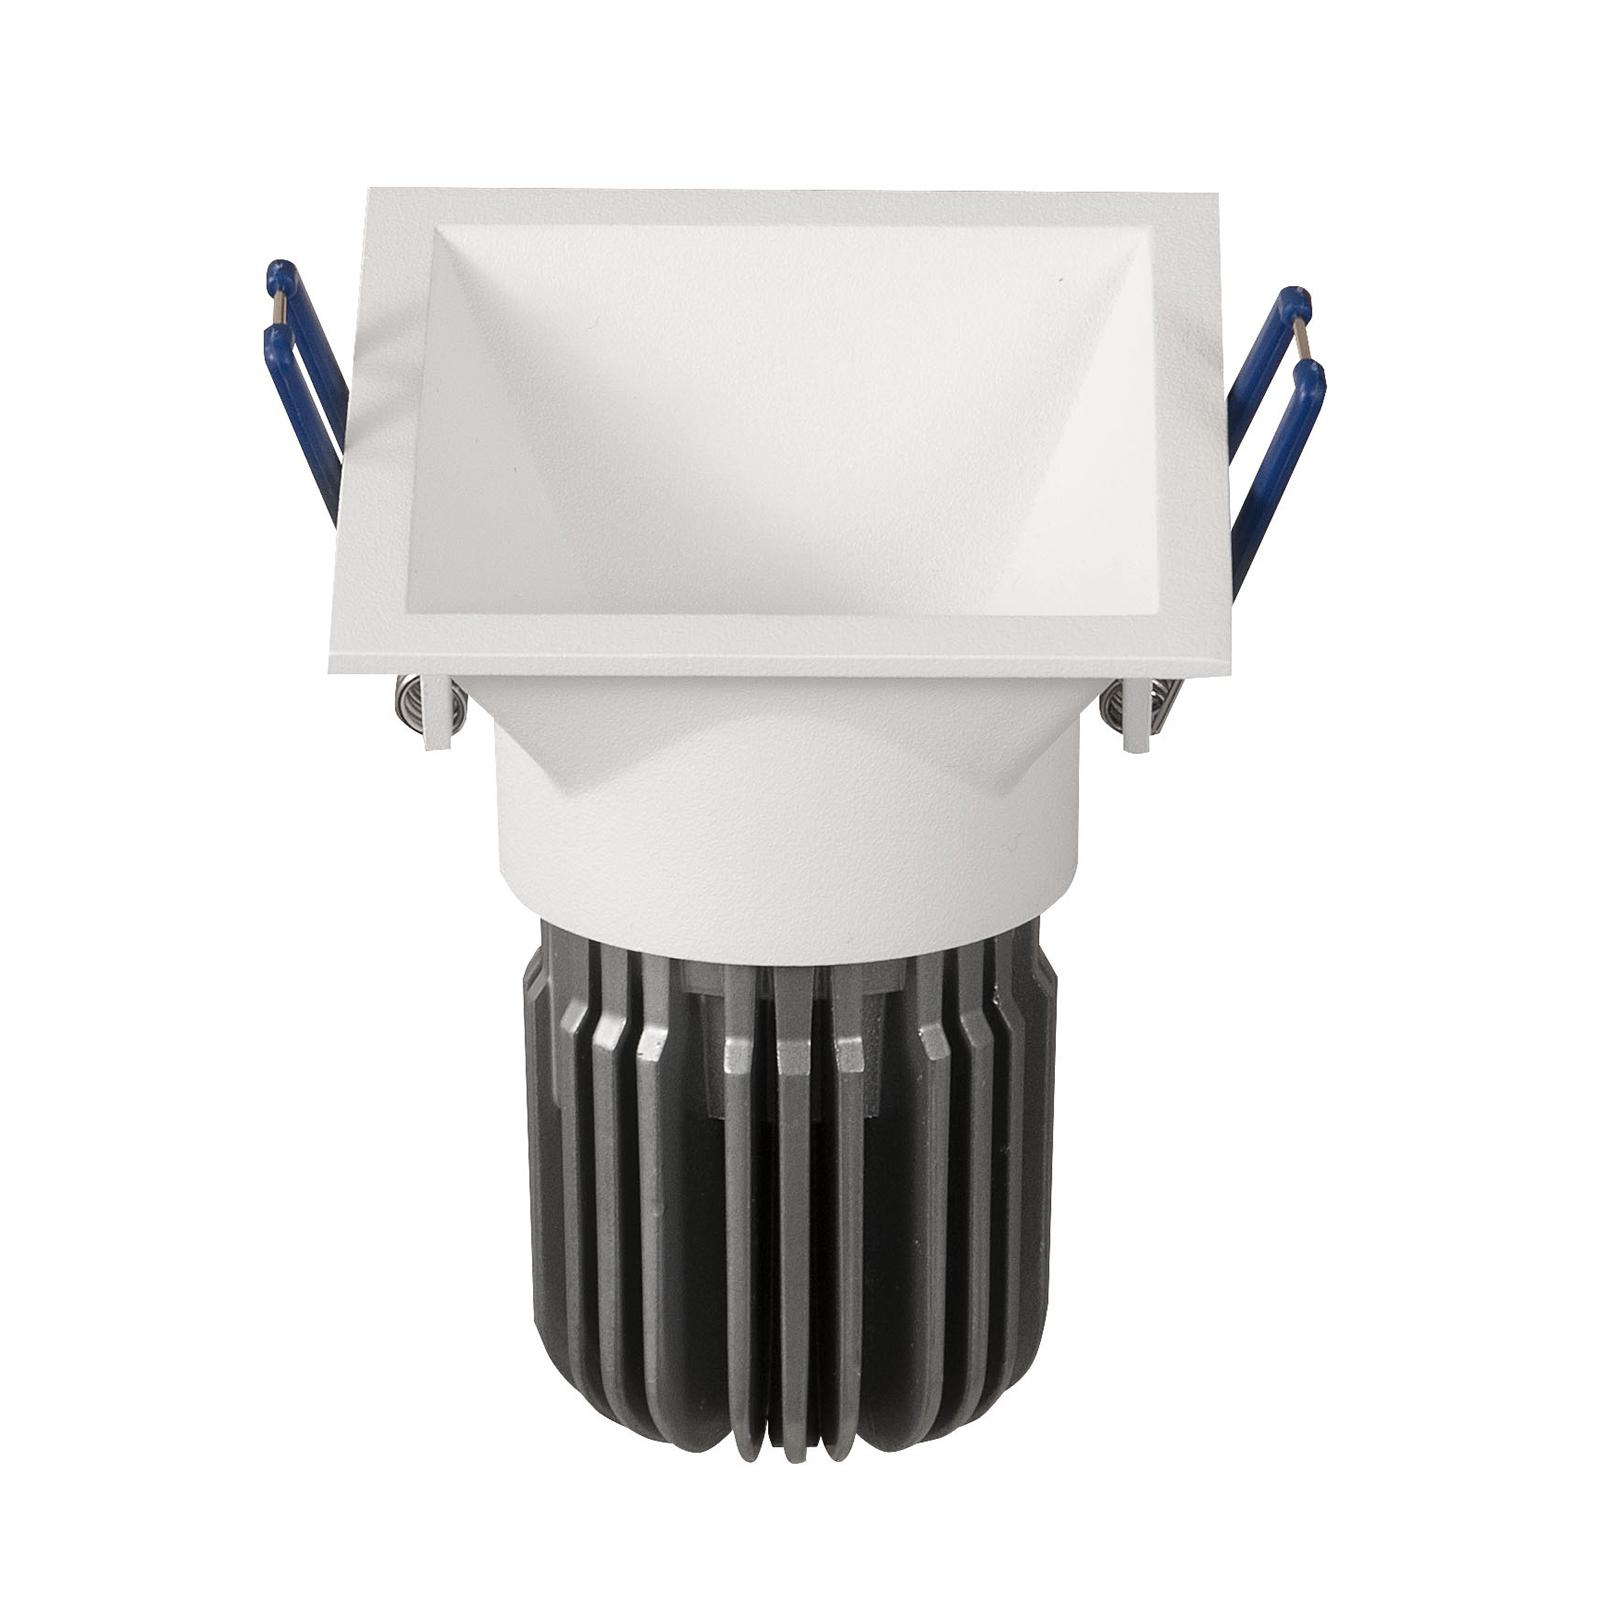 LED-Einbauspot Toodle eckig asymmetrisch, weiß